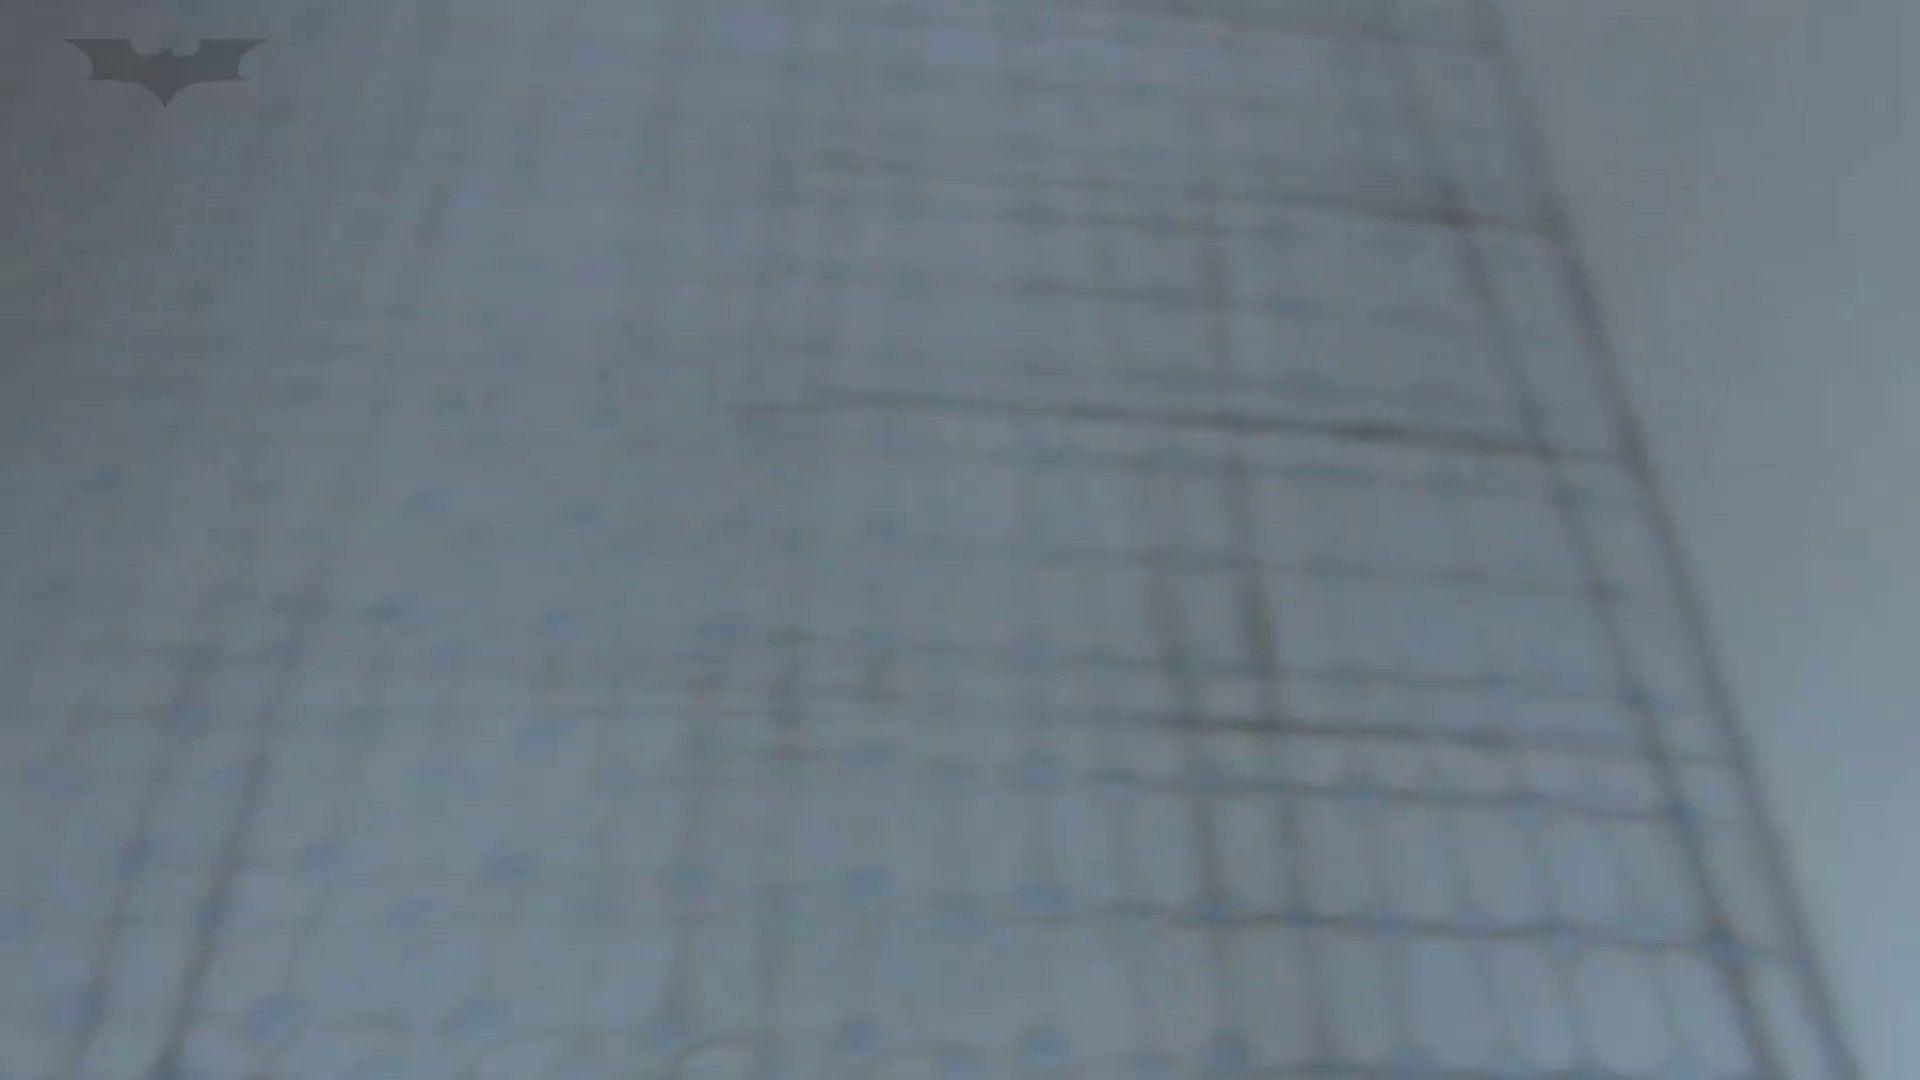 JD盗撮 美女の洗面所の秘密 Vol.40 盗撮 おまんこ無修正動画無料 68pic 43